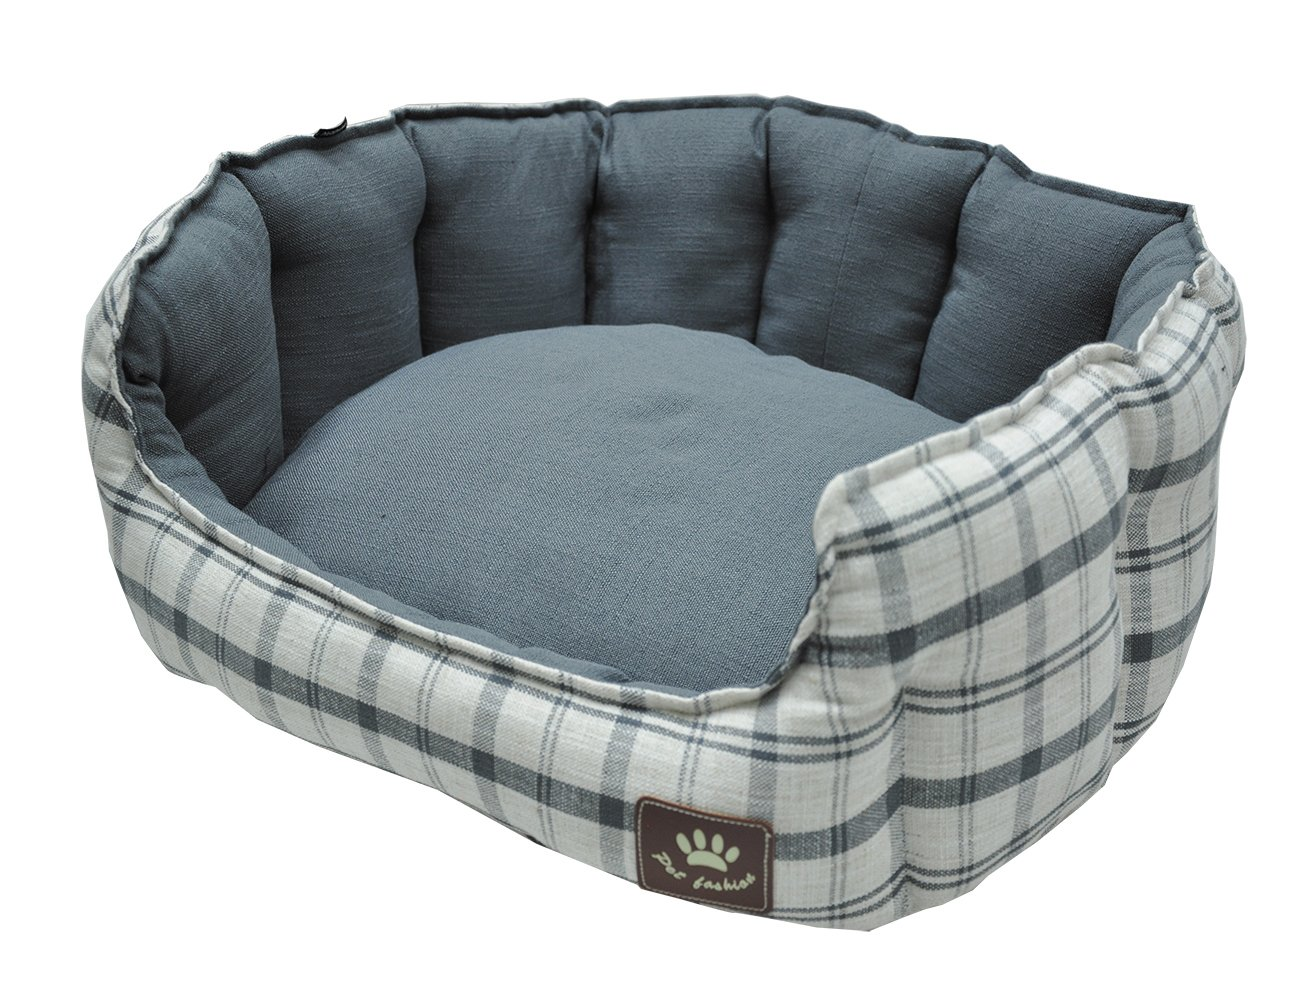 VADIGRAN Checker Style Dog Bed, 86 x 70 cm, Grey